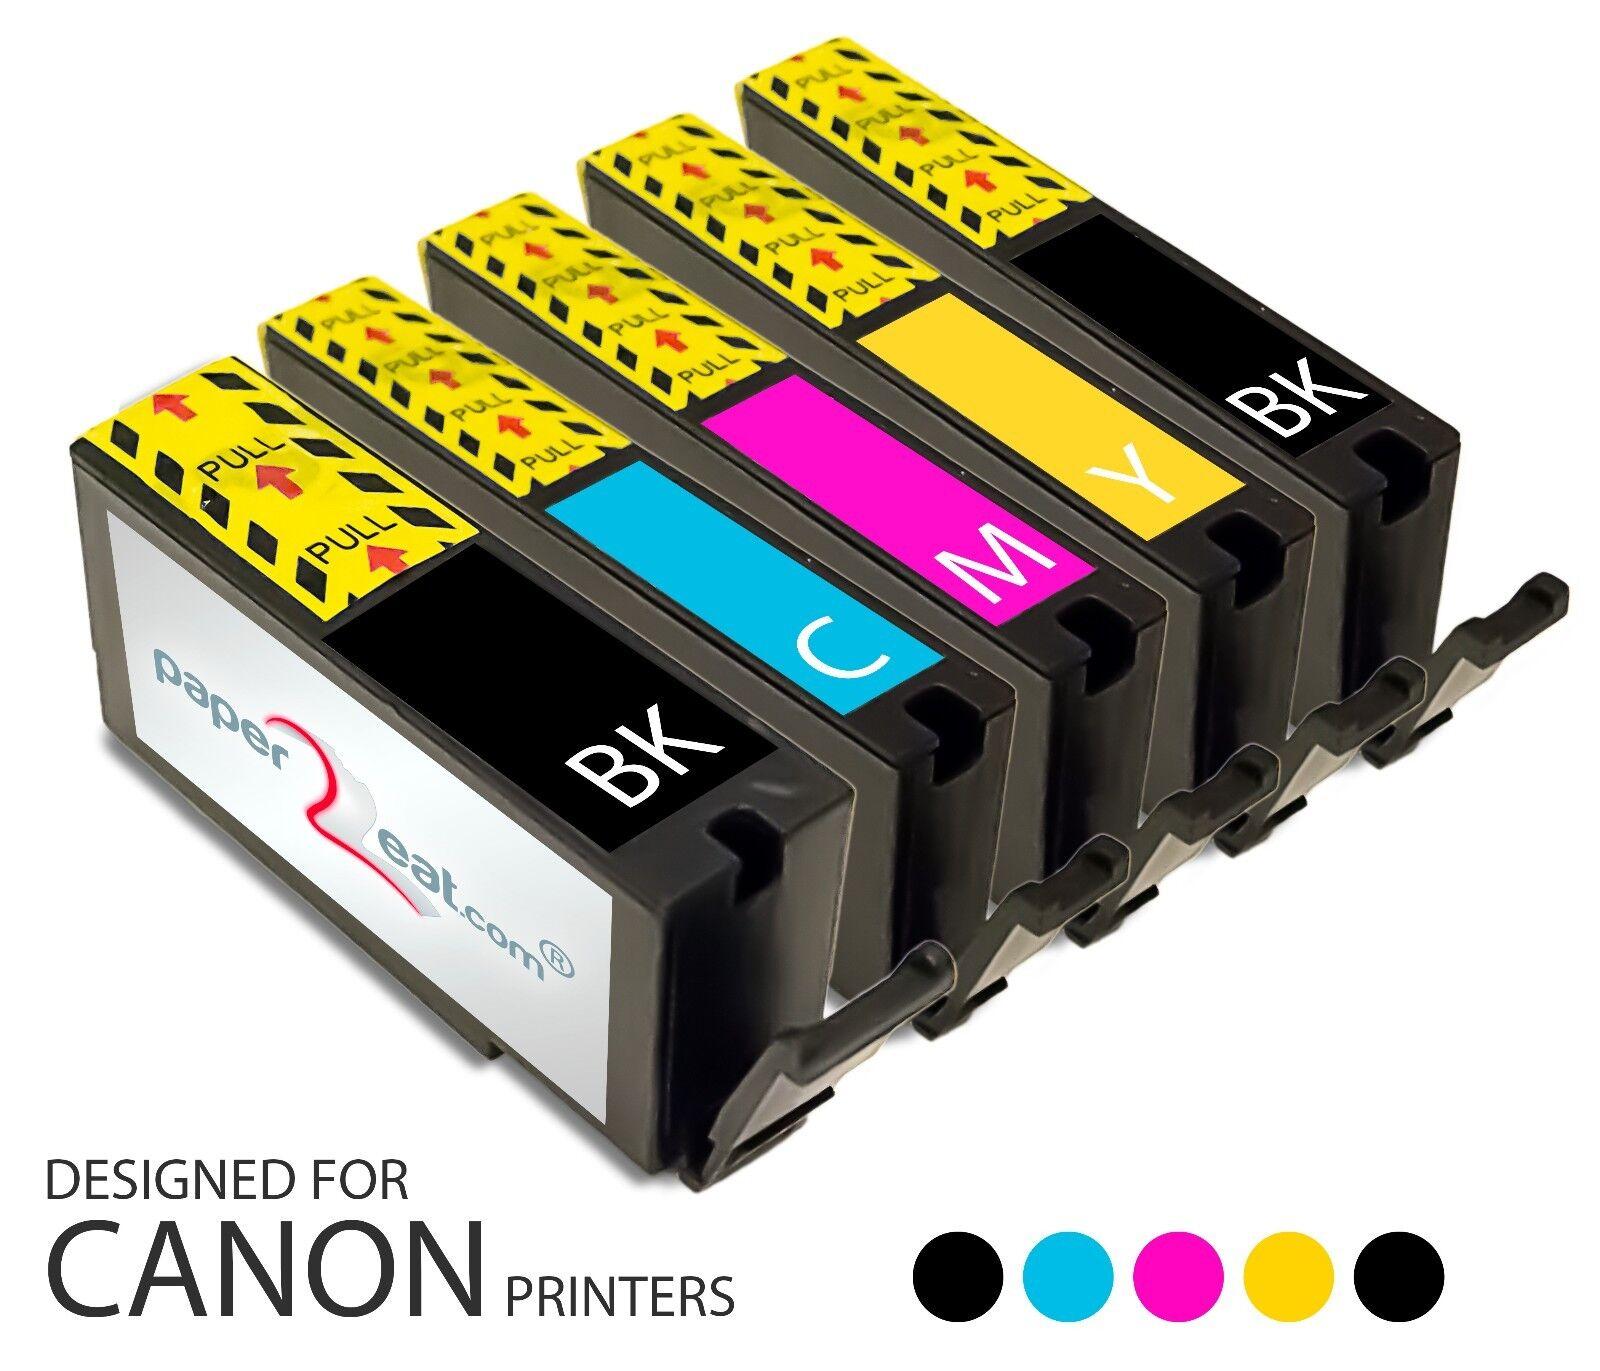 Set of 5 Refillable Edible Ink Cartridges Canon MG6420 PGI-250   CLI-251 Series